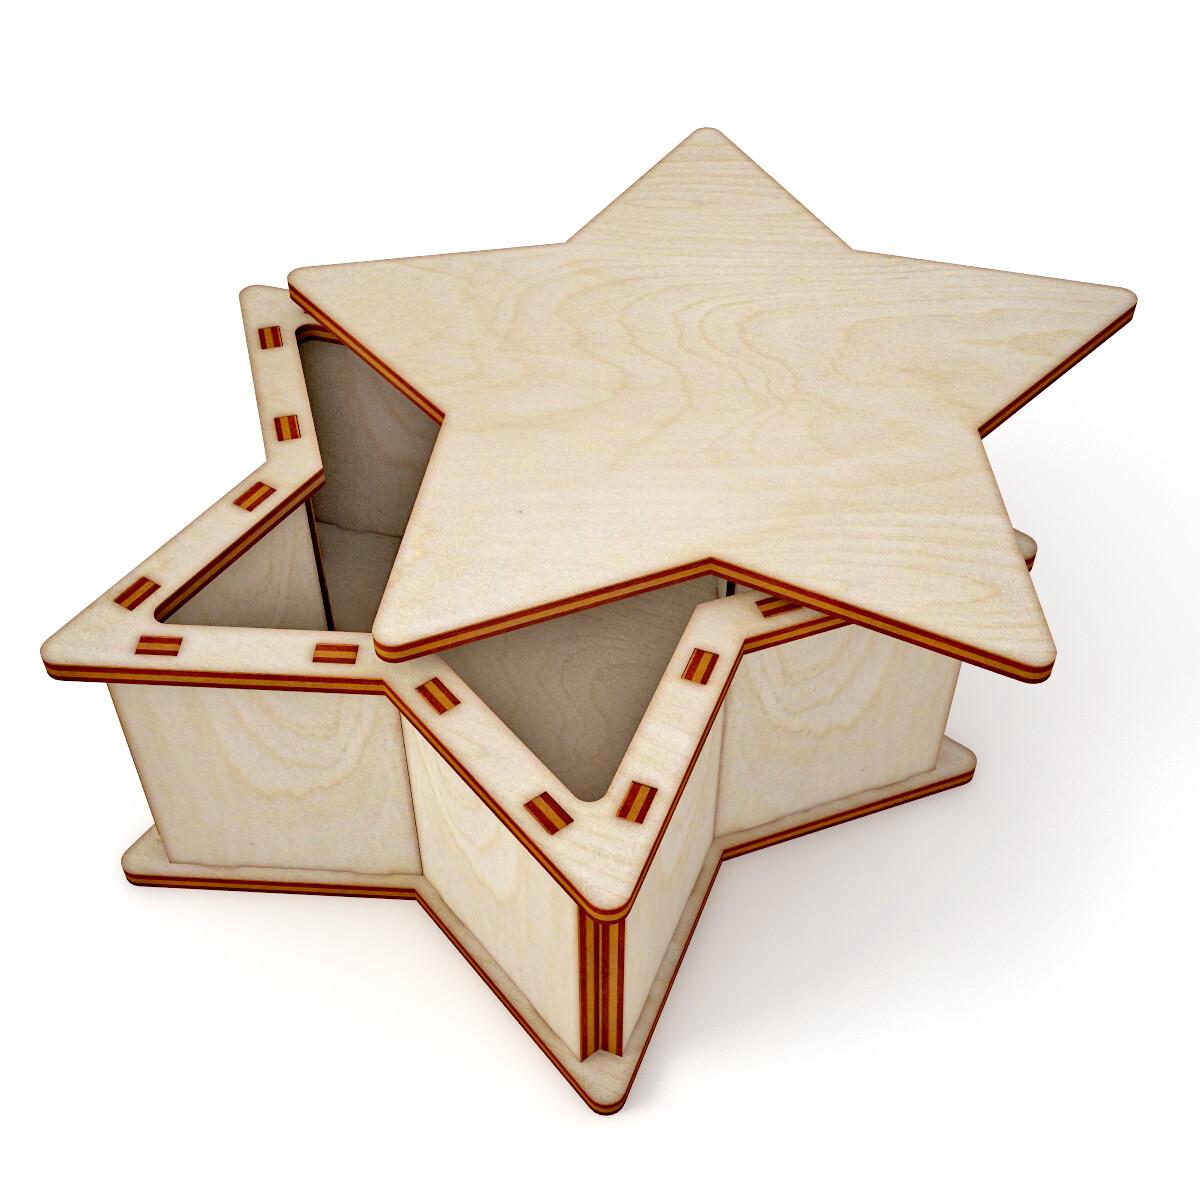 Laser Cut Wooden Star Gift Box Free Vector